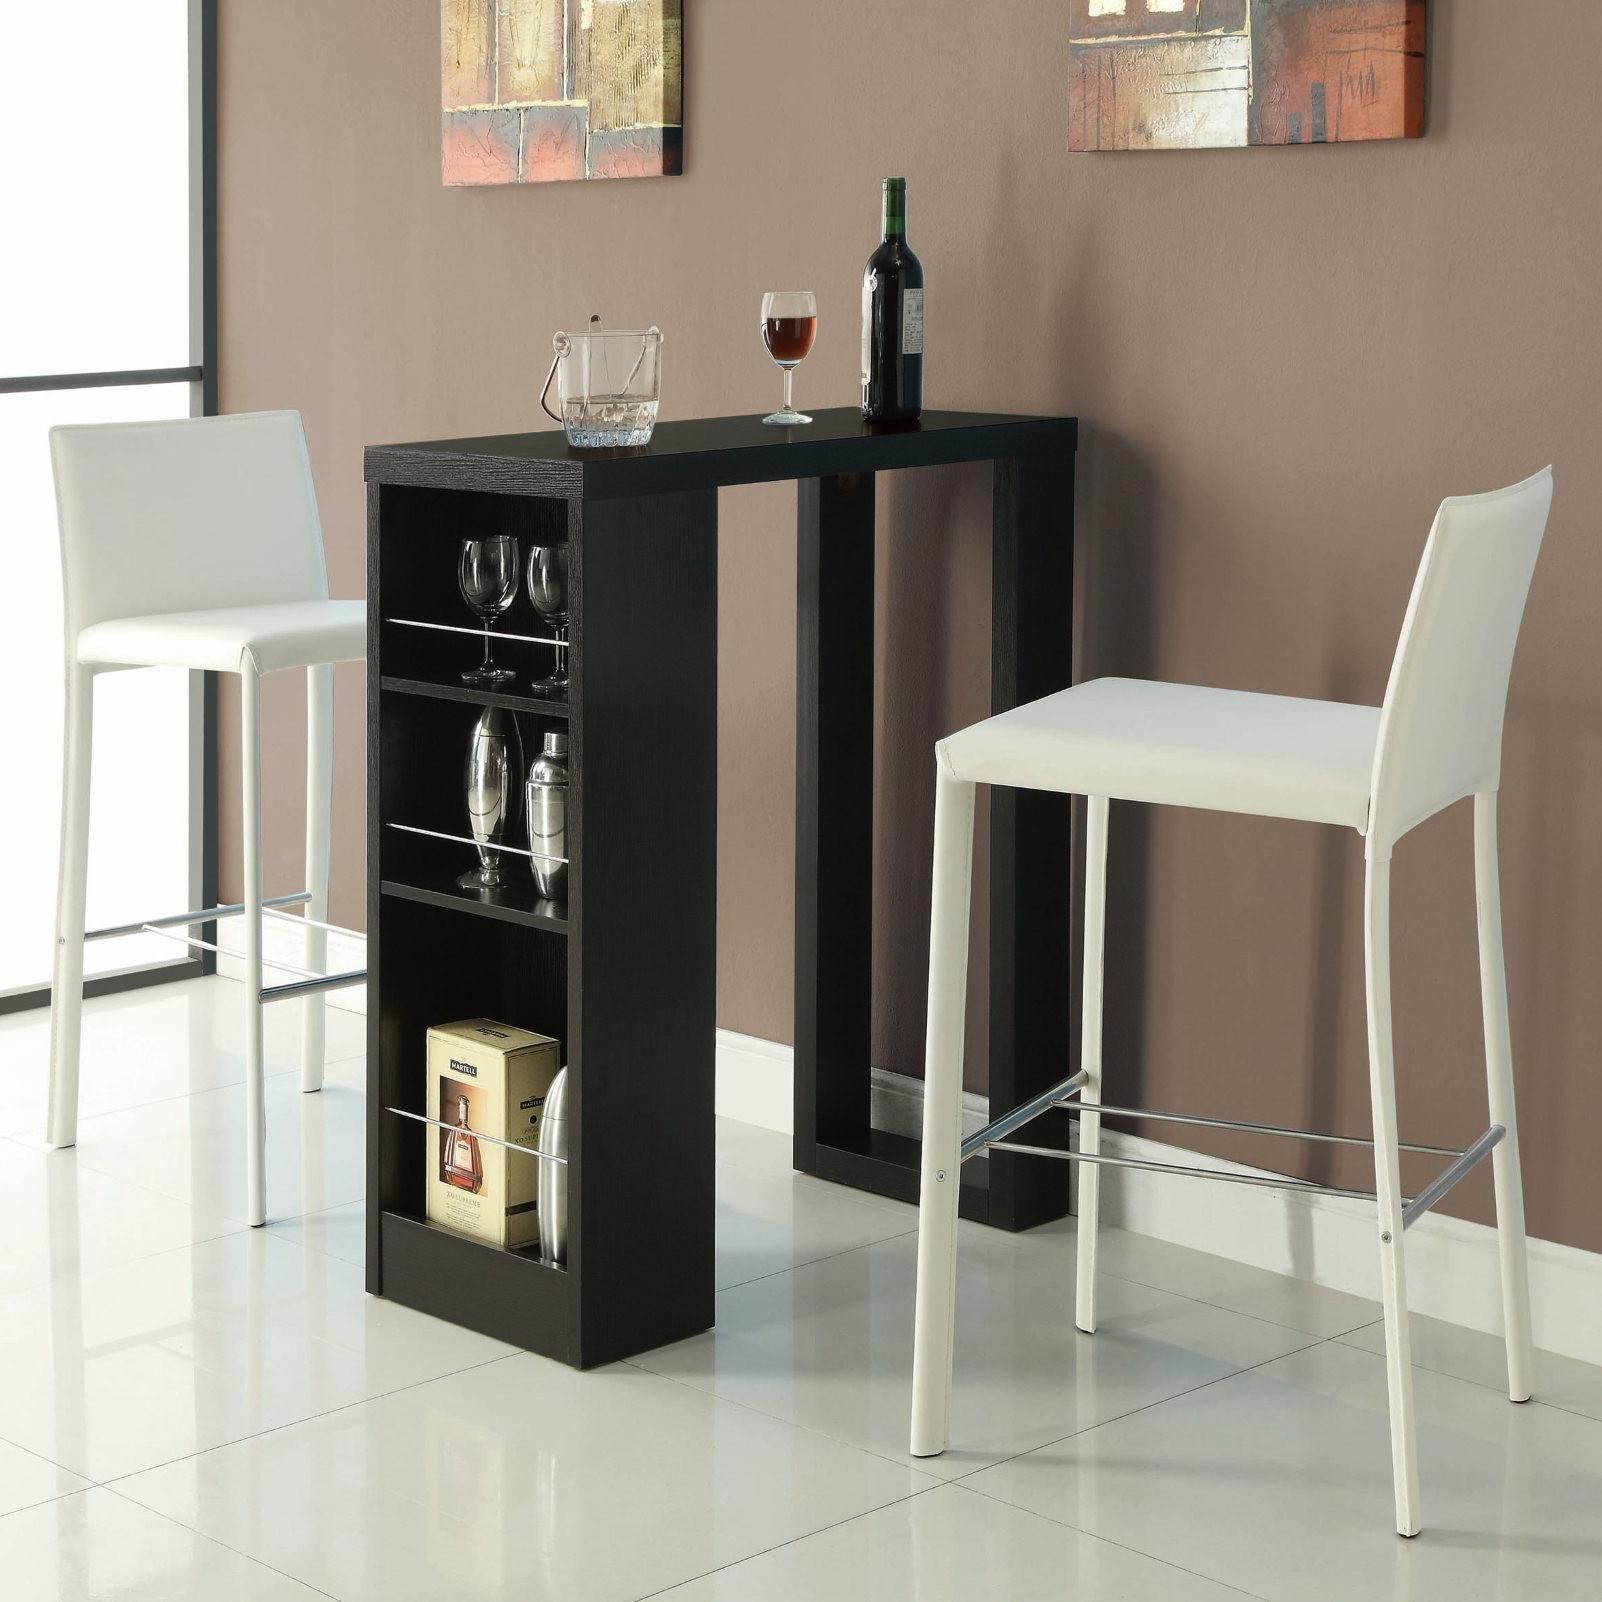 Pub tables with storage & Pub Tables With Storage - Foter